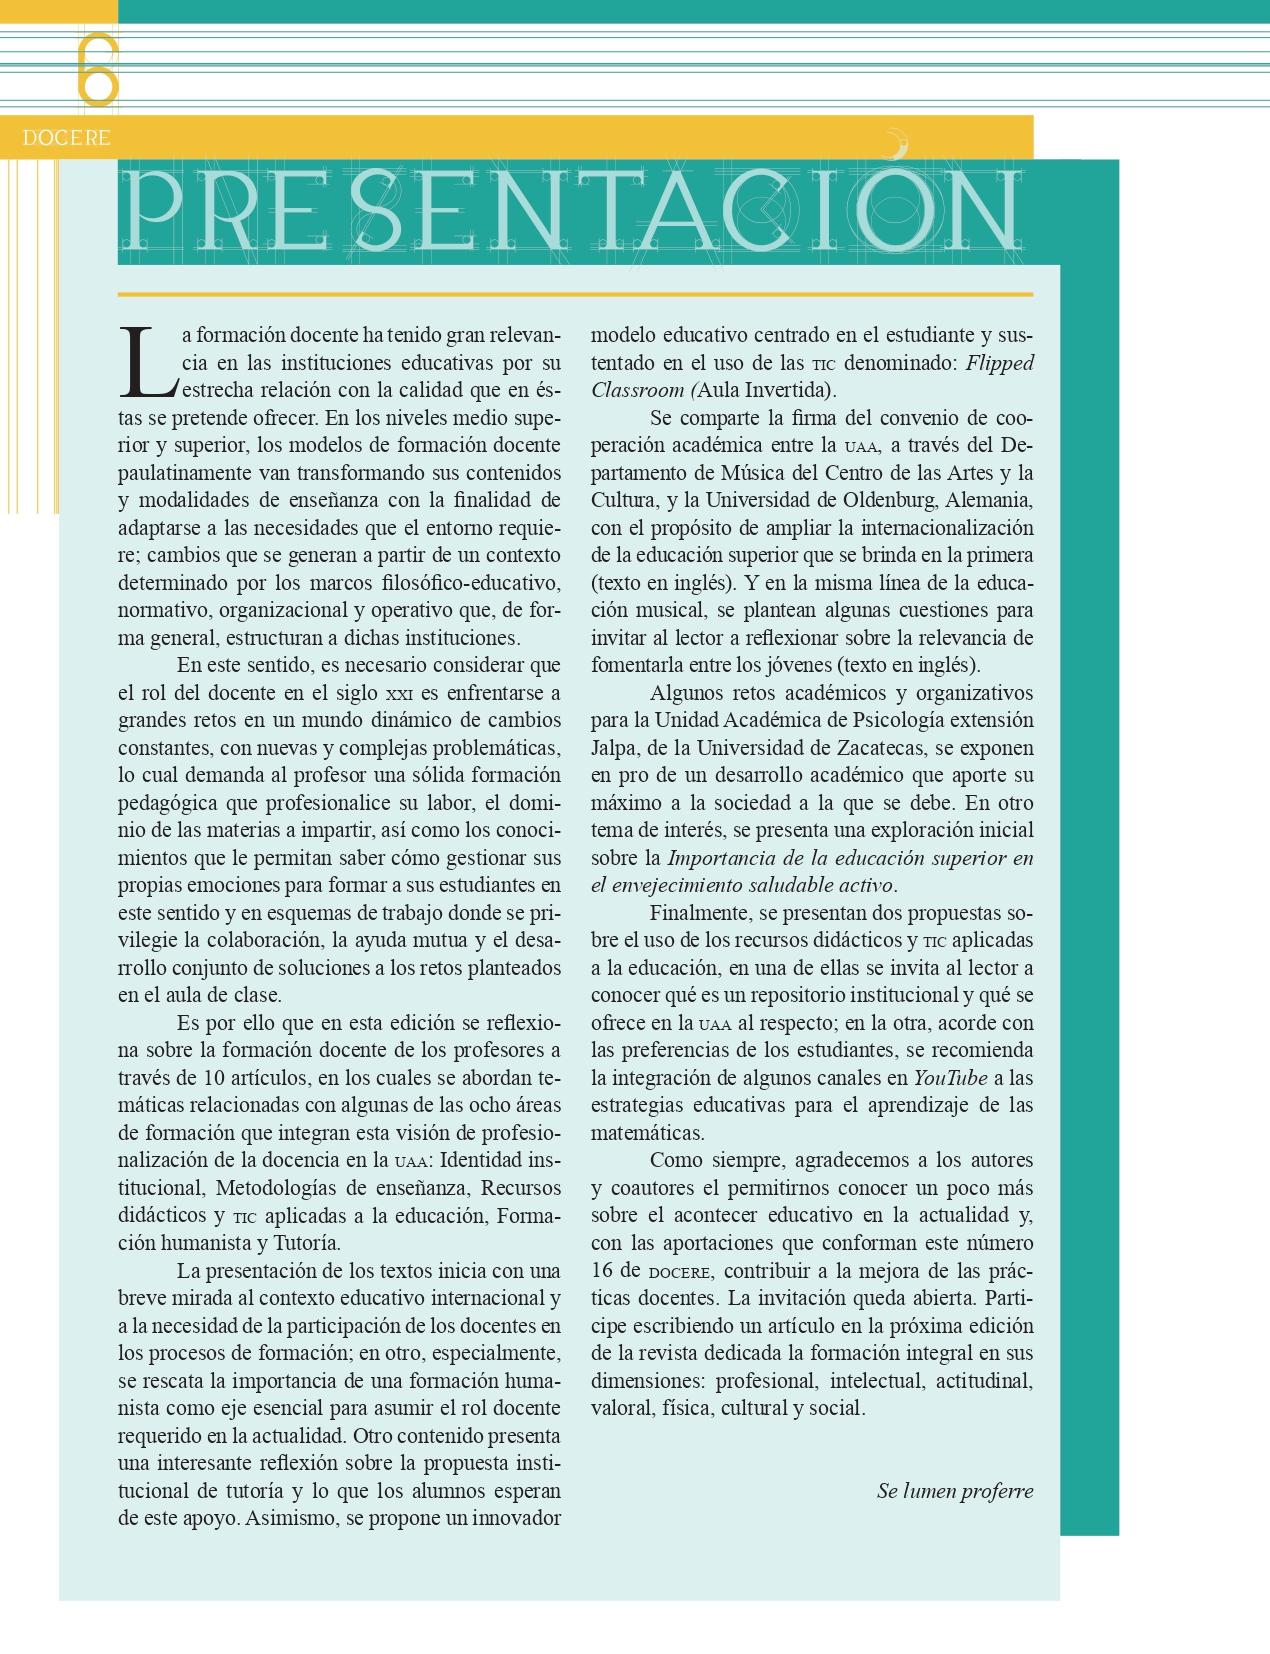 imagen-presentación